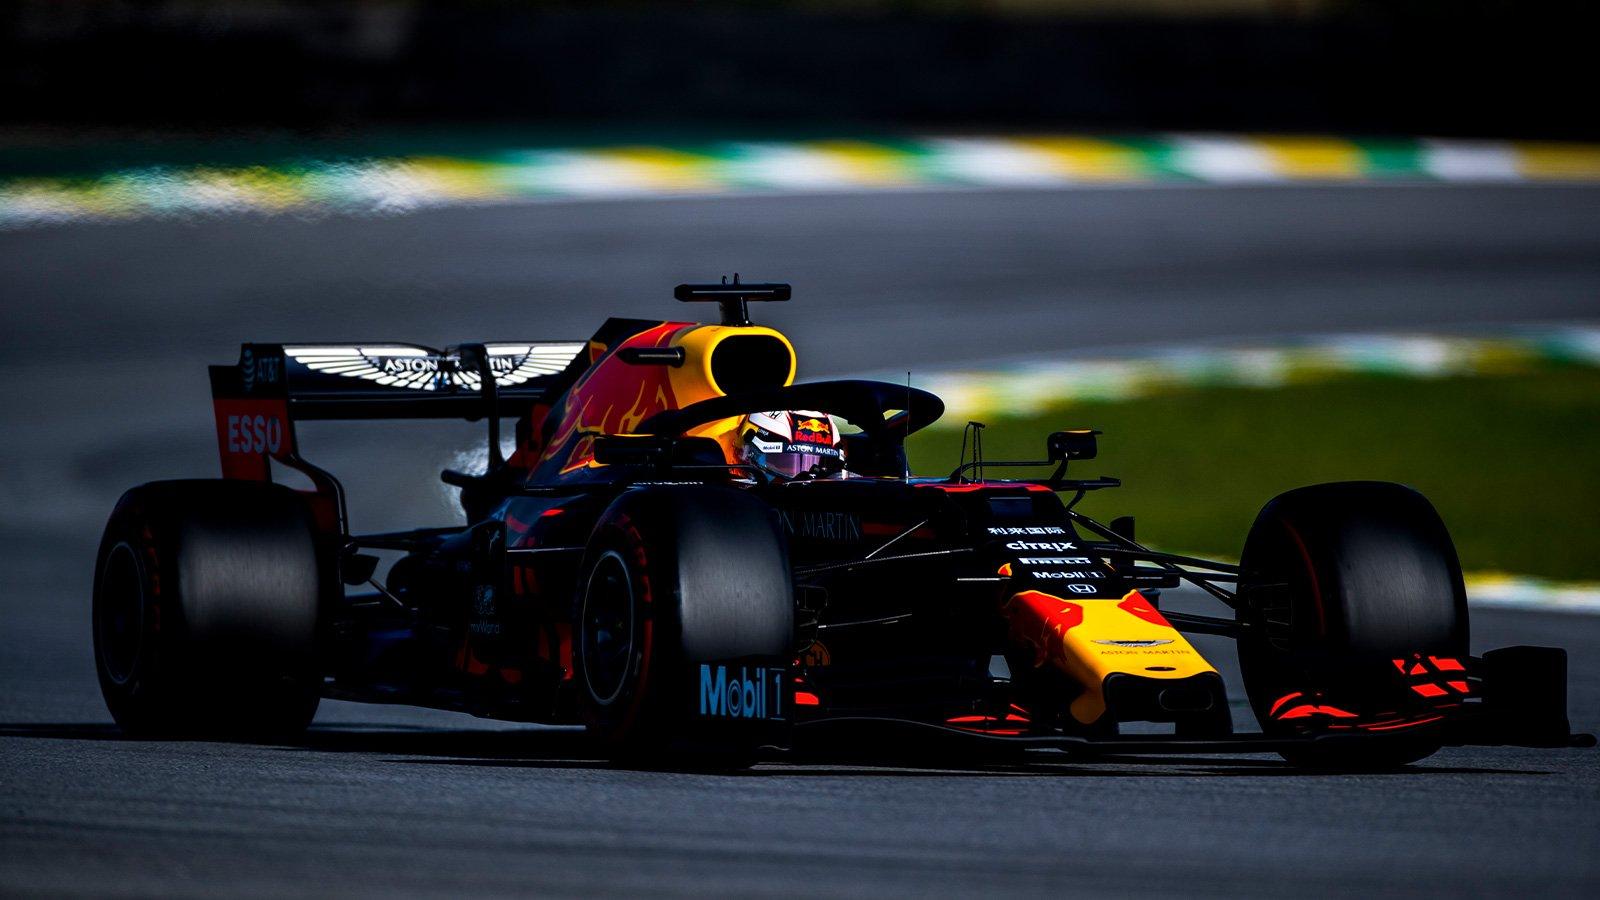 Victoire de Verstappen devant Gasly 1